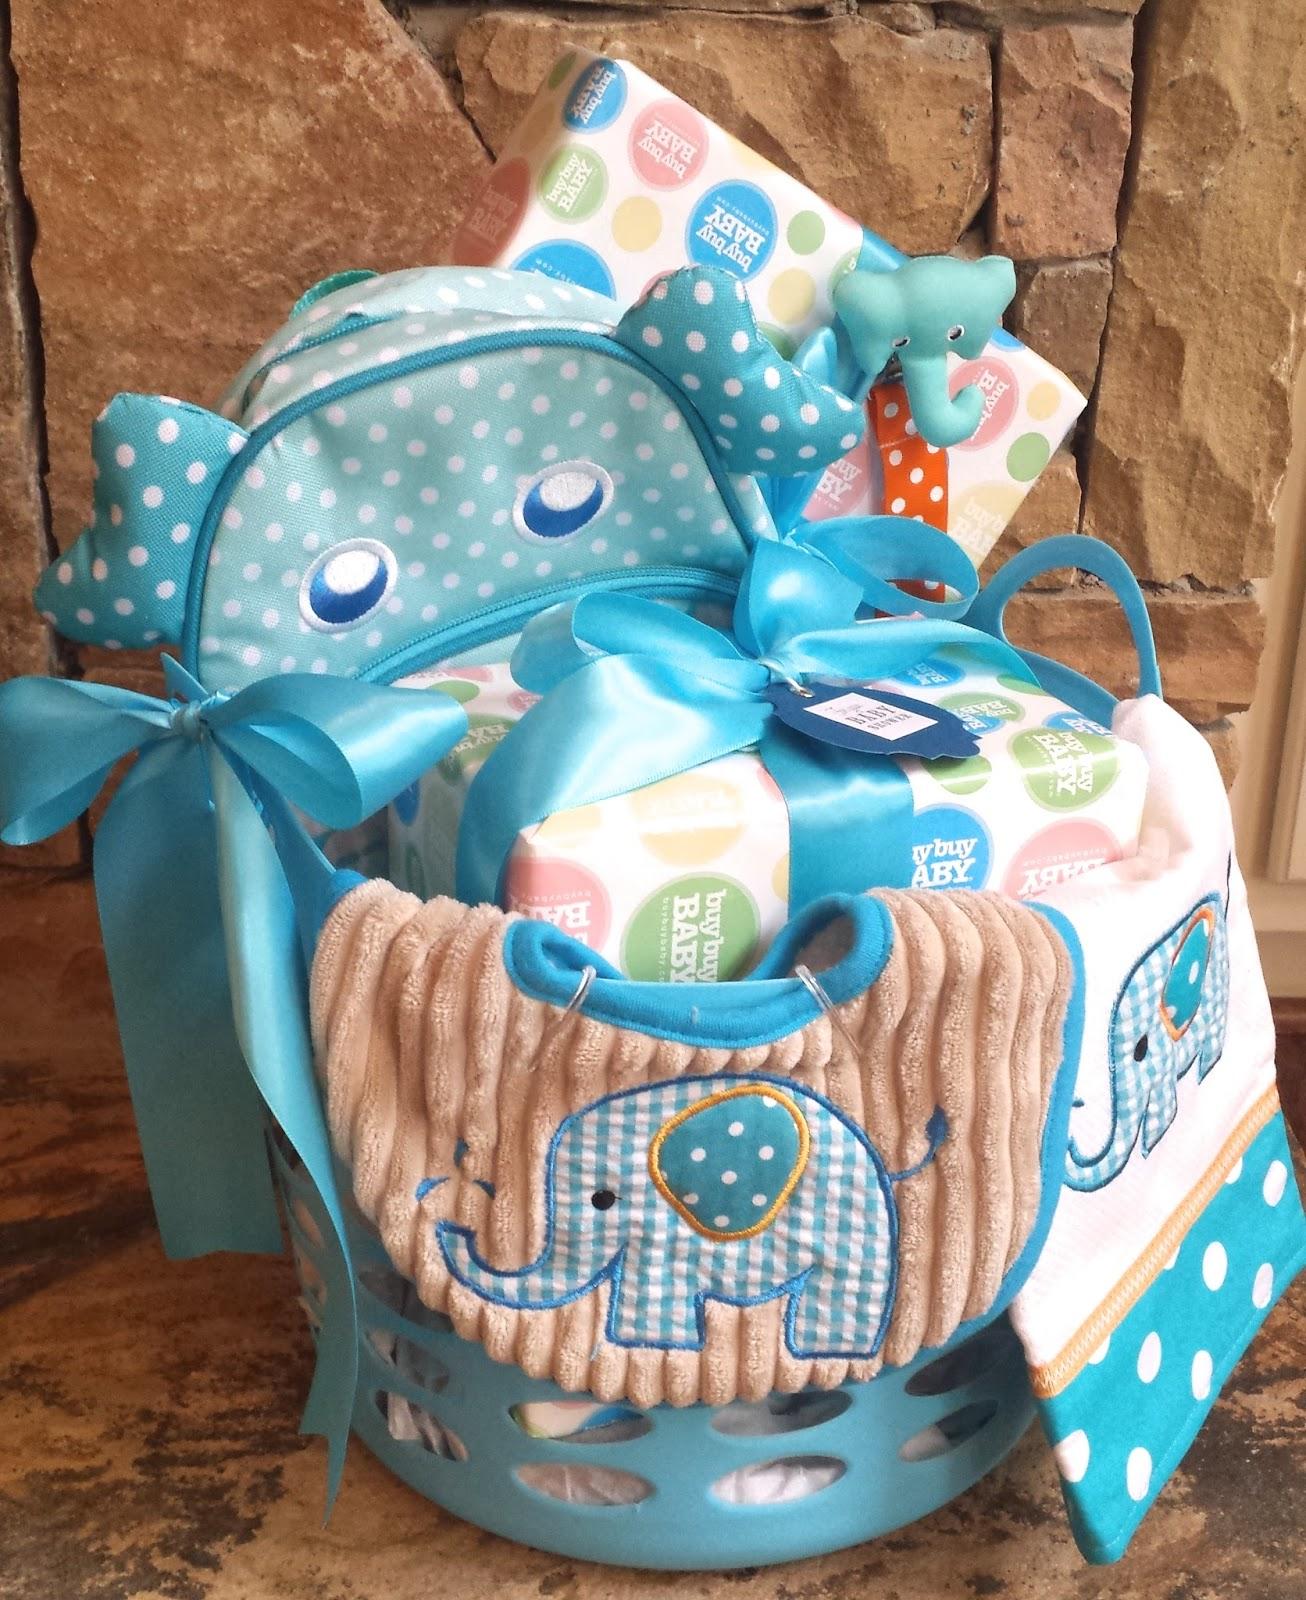 503722145fb9a Diy Baby Shower Gift Basket And Bow Diy Ideas · Diy Baby Shower ...